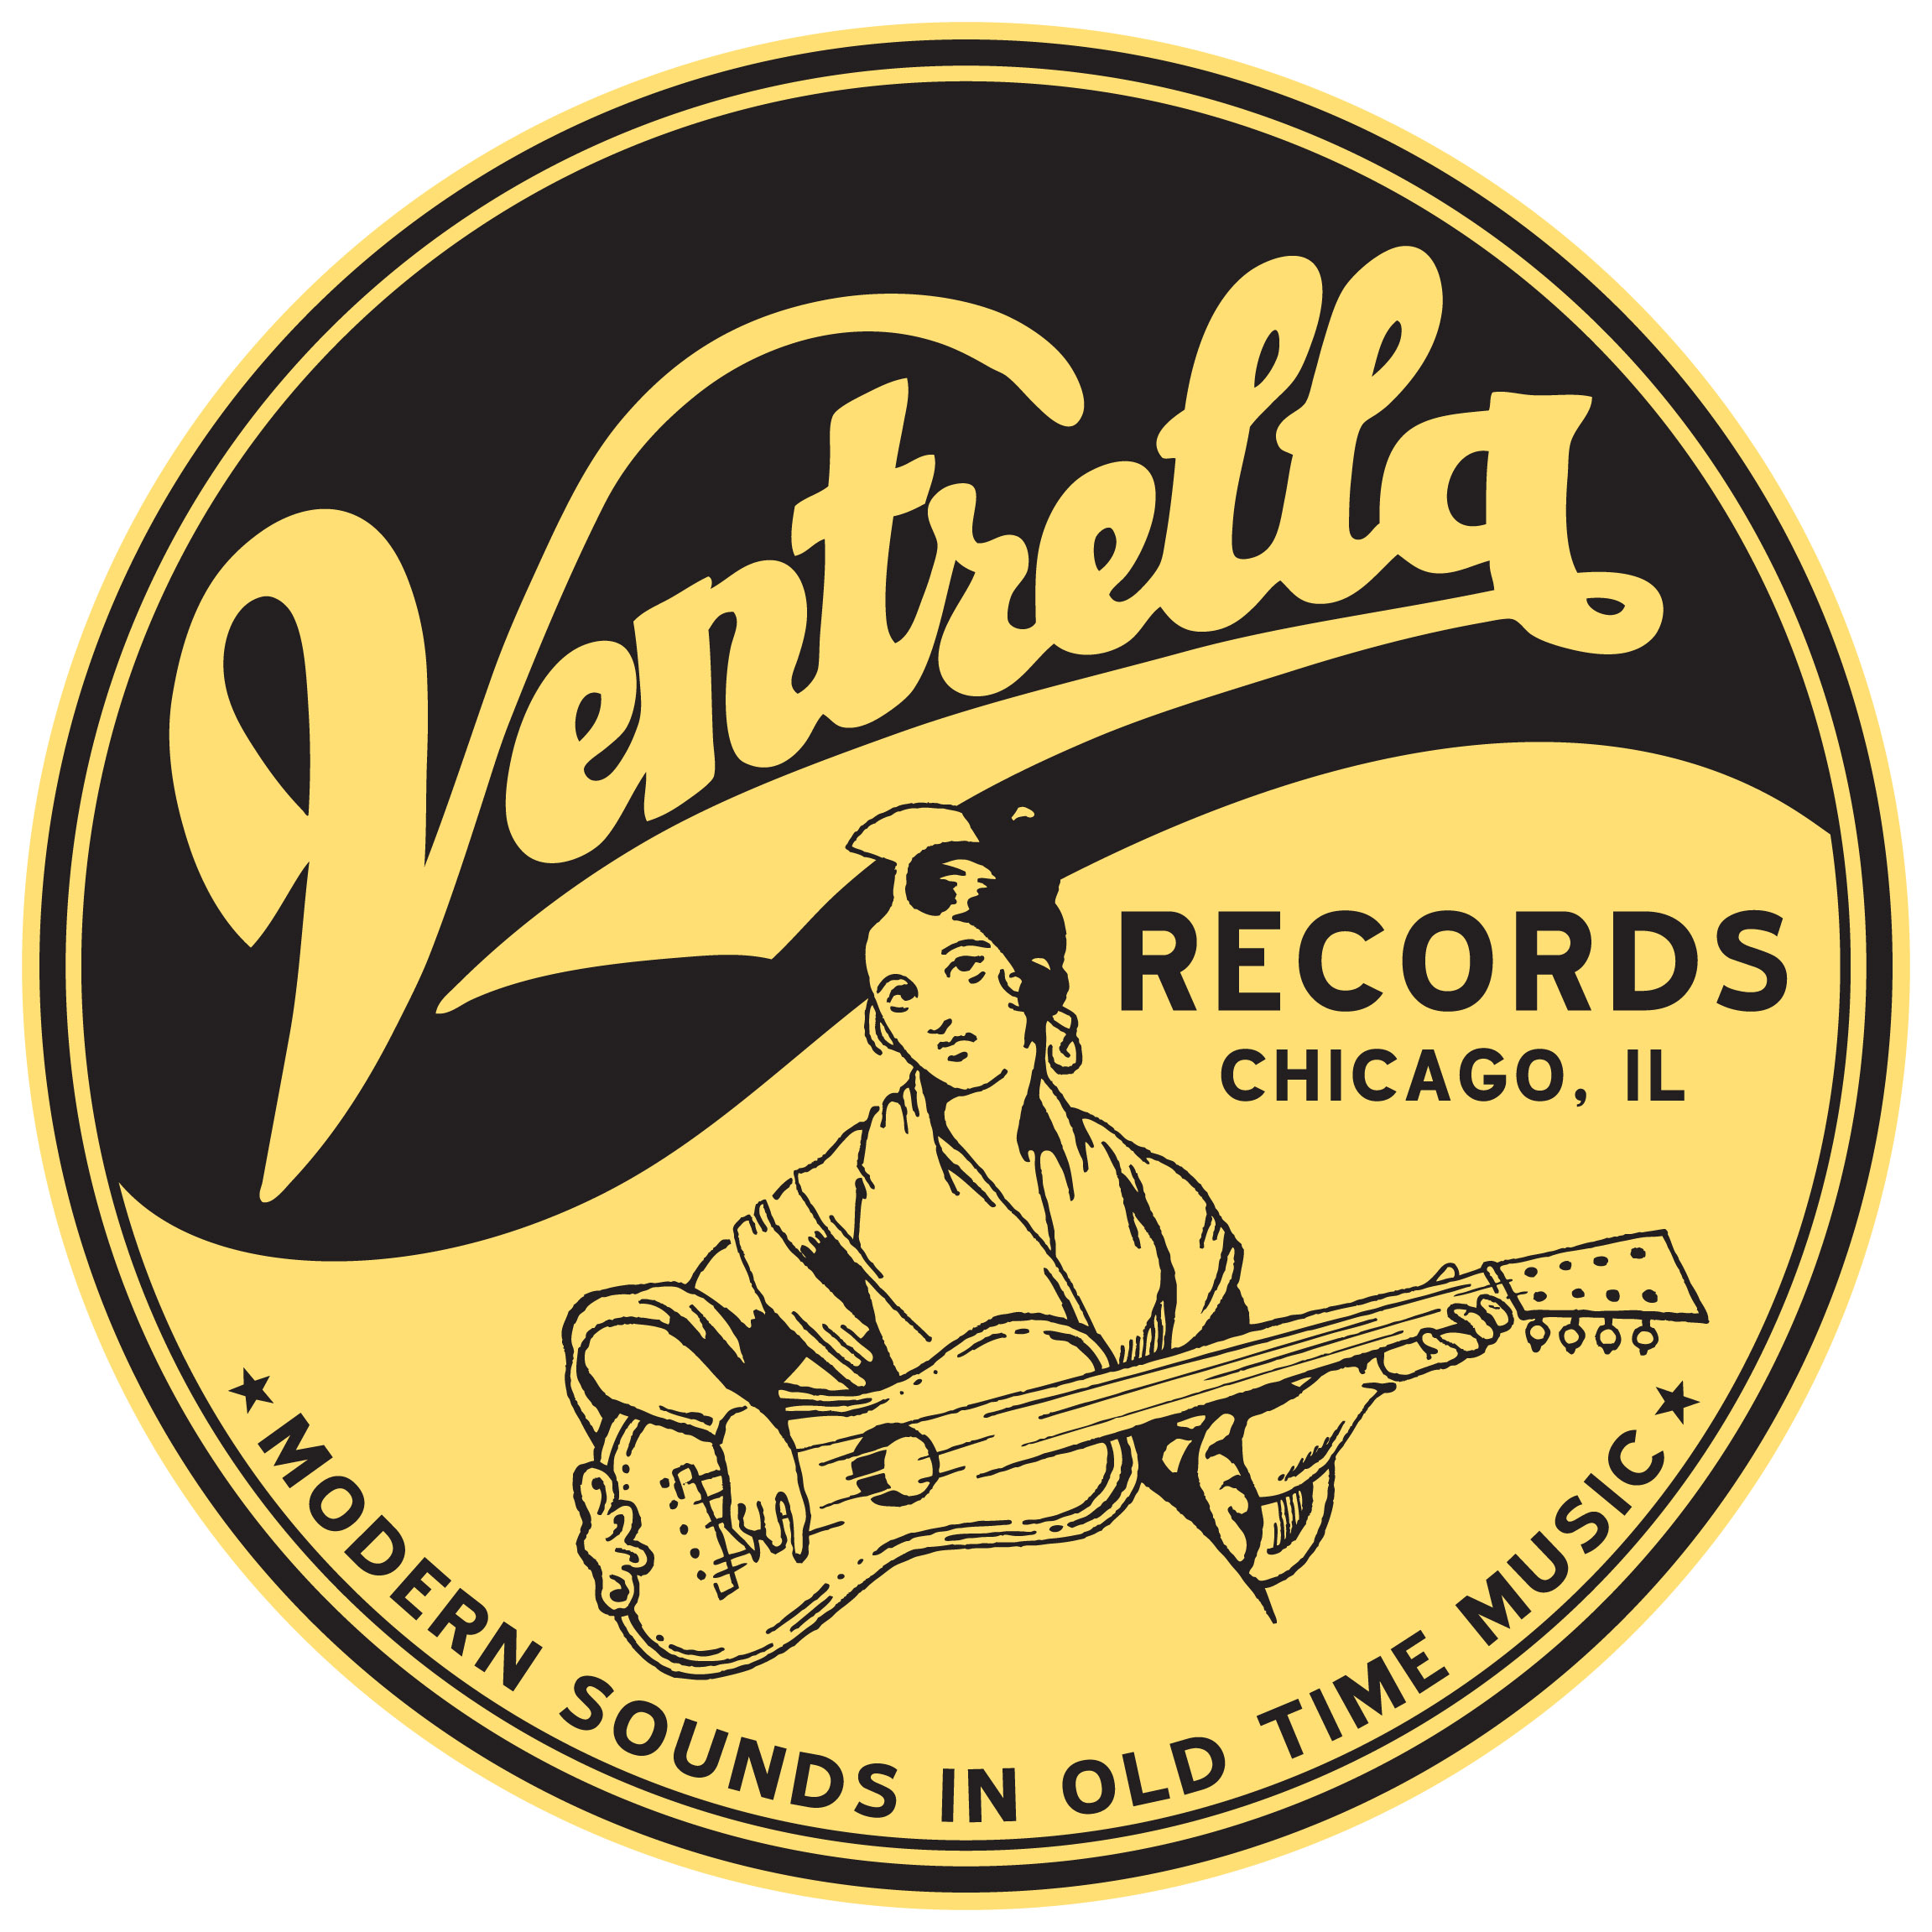 Ventrella Records logo, designed and illustrated by Joel Paterson